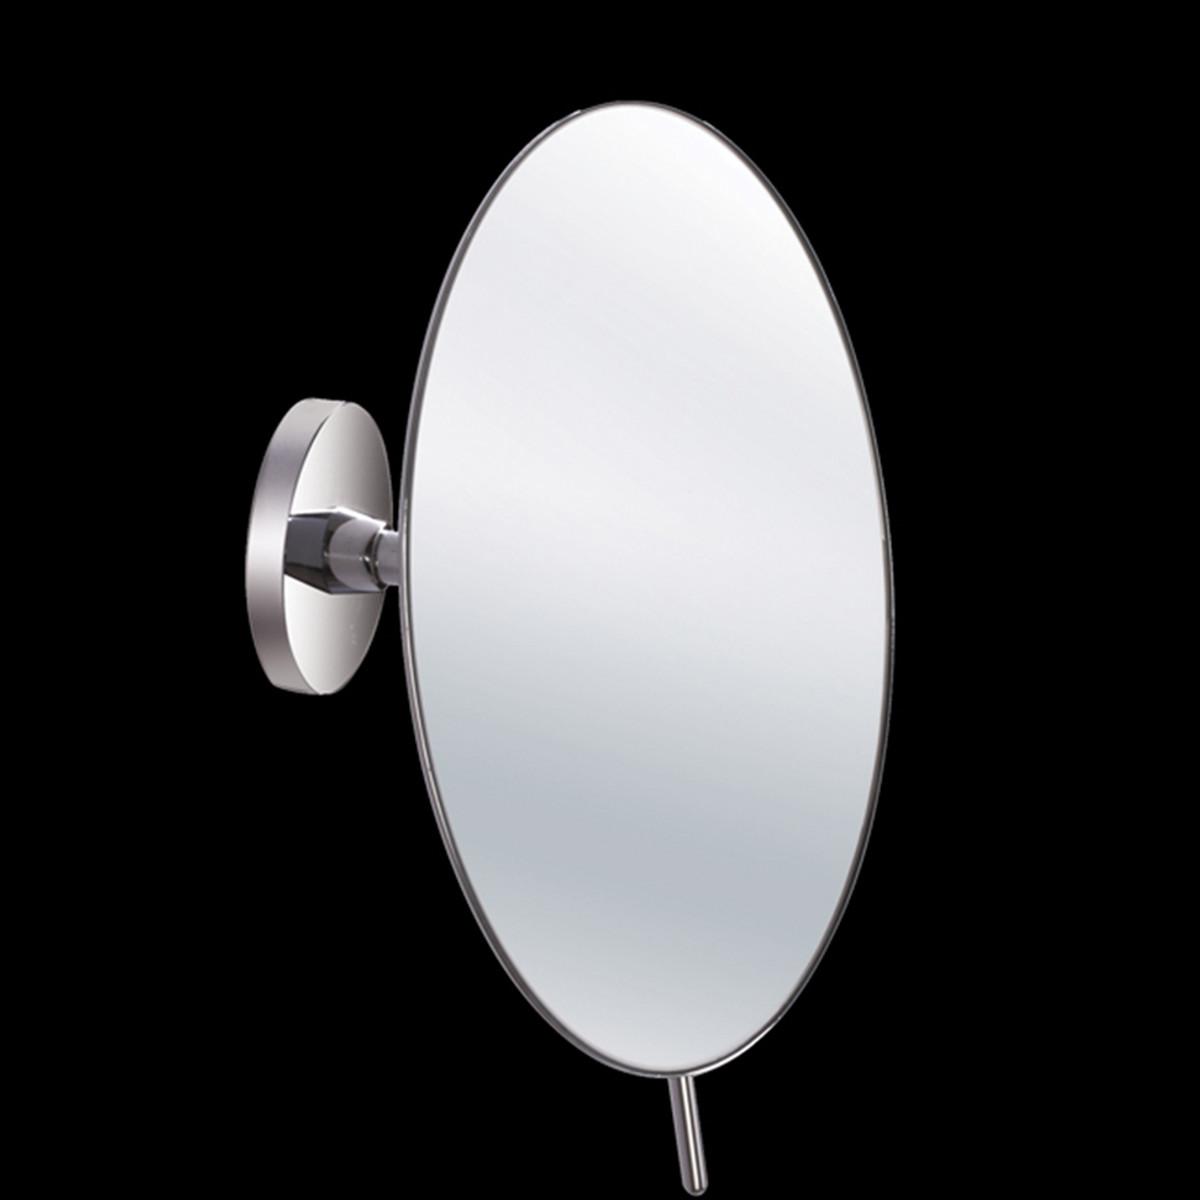 SP7504 MEGA Mirror